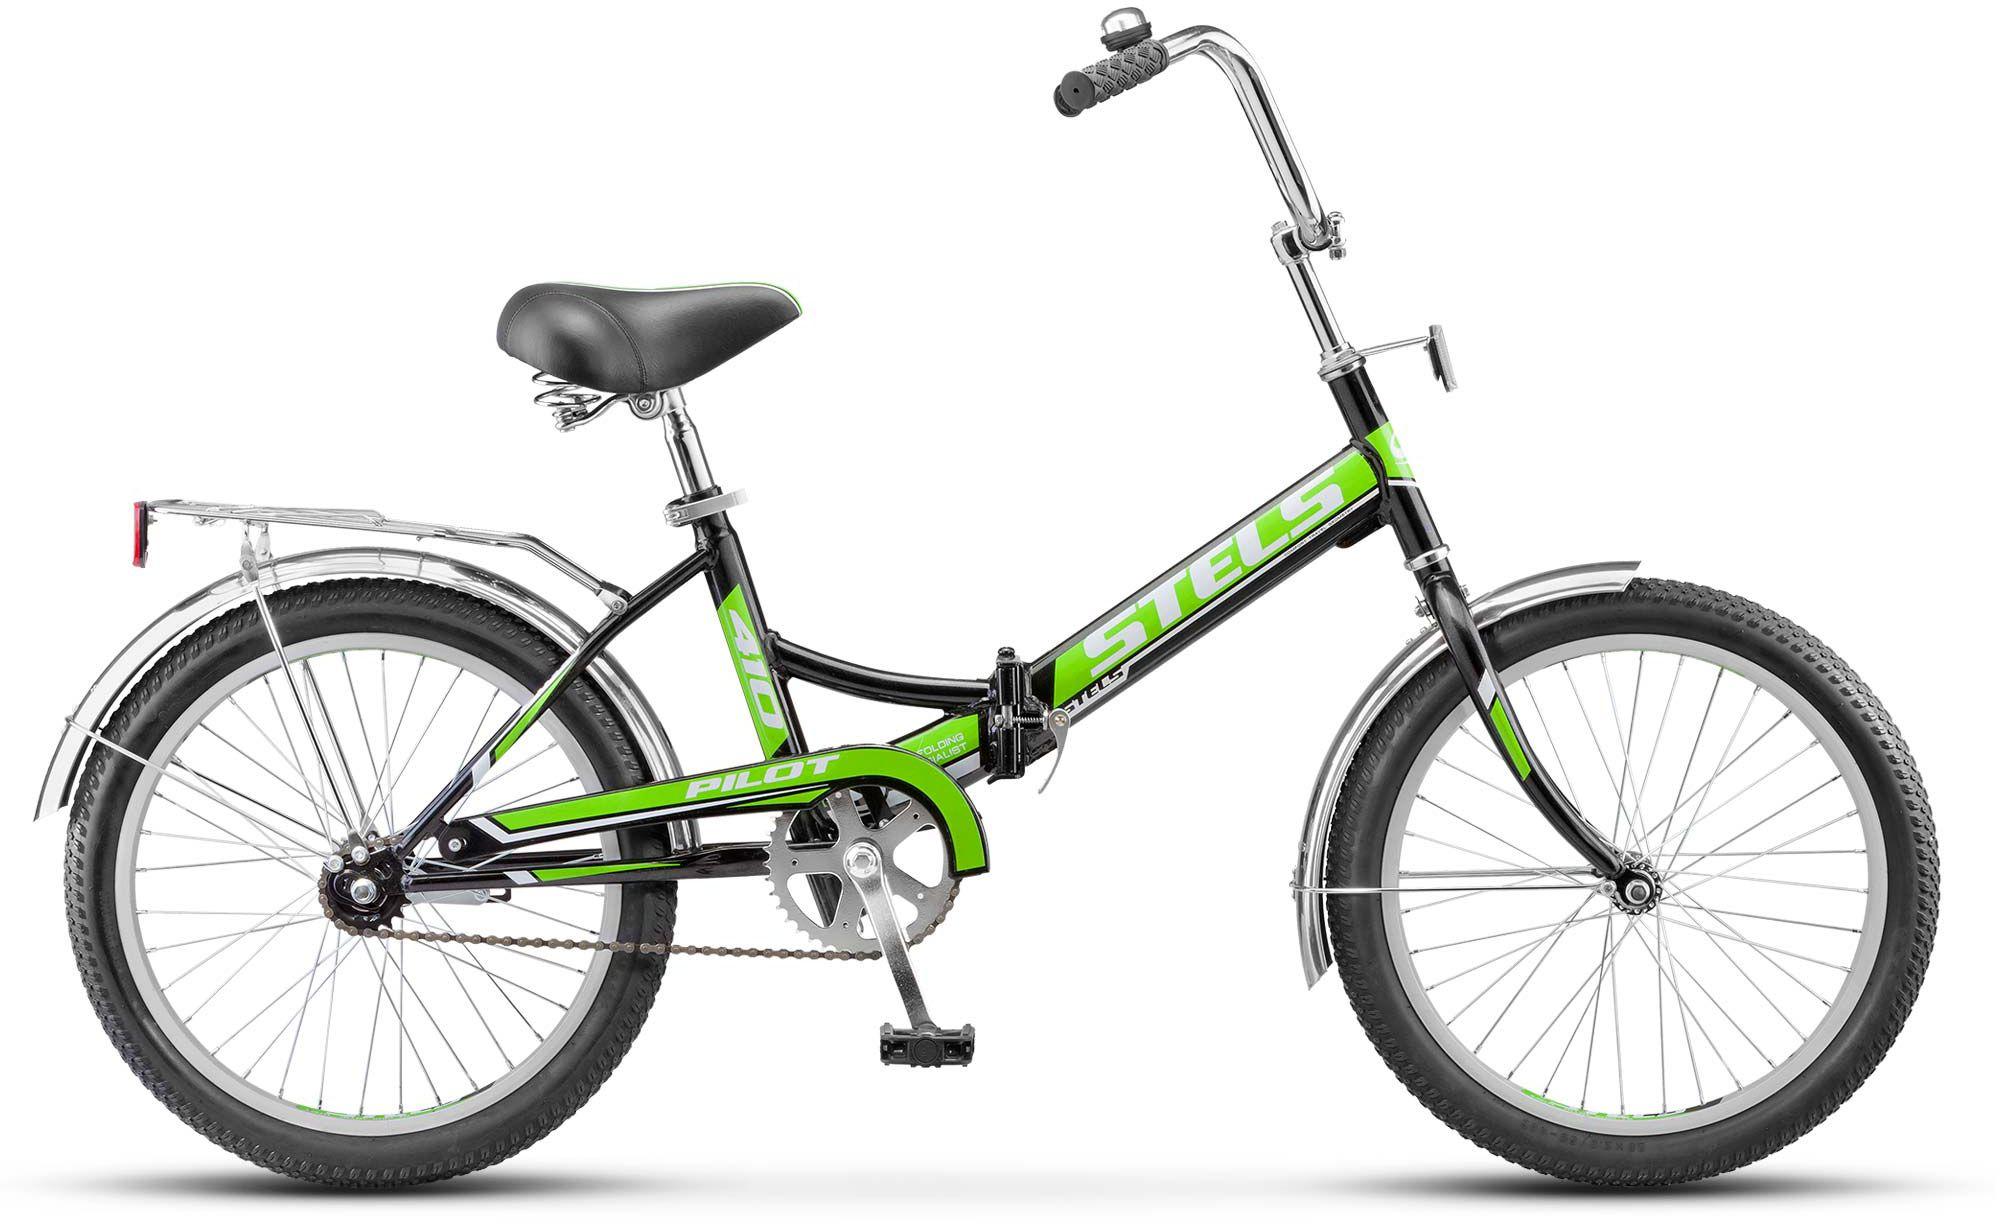 Велосипед Stels Pilot 410 2017,  Складные  - артикул:278546